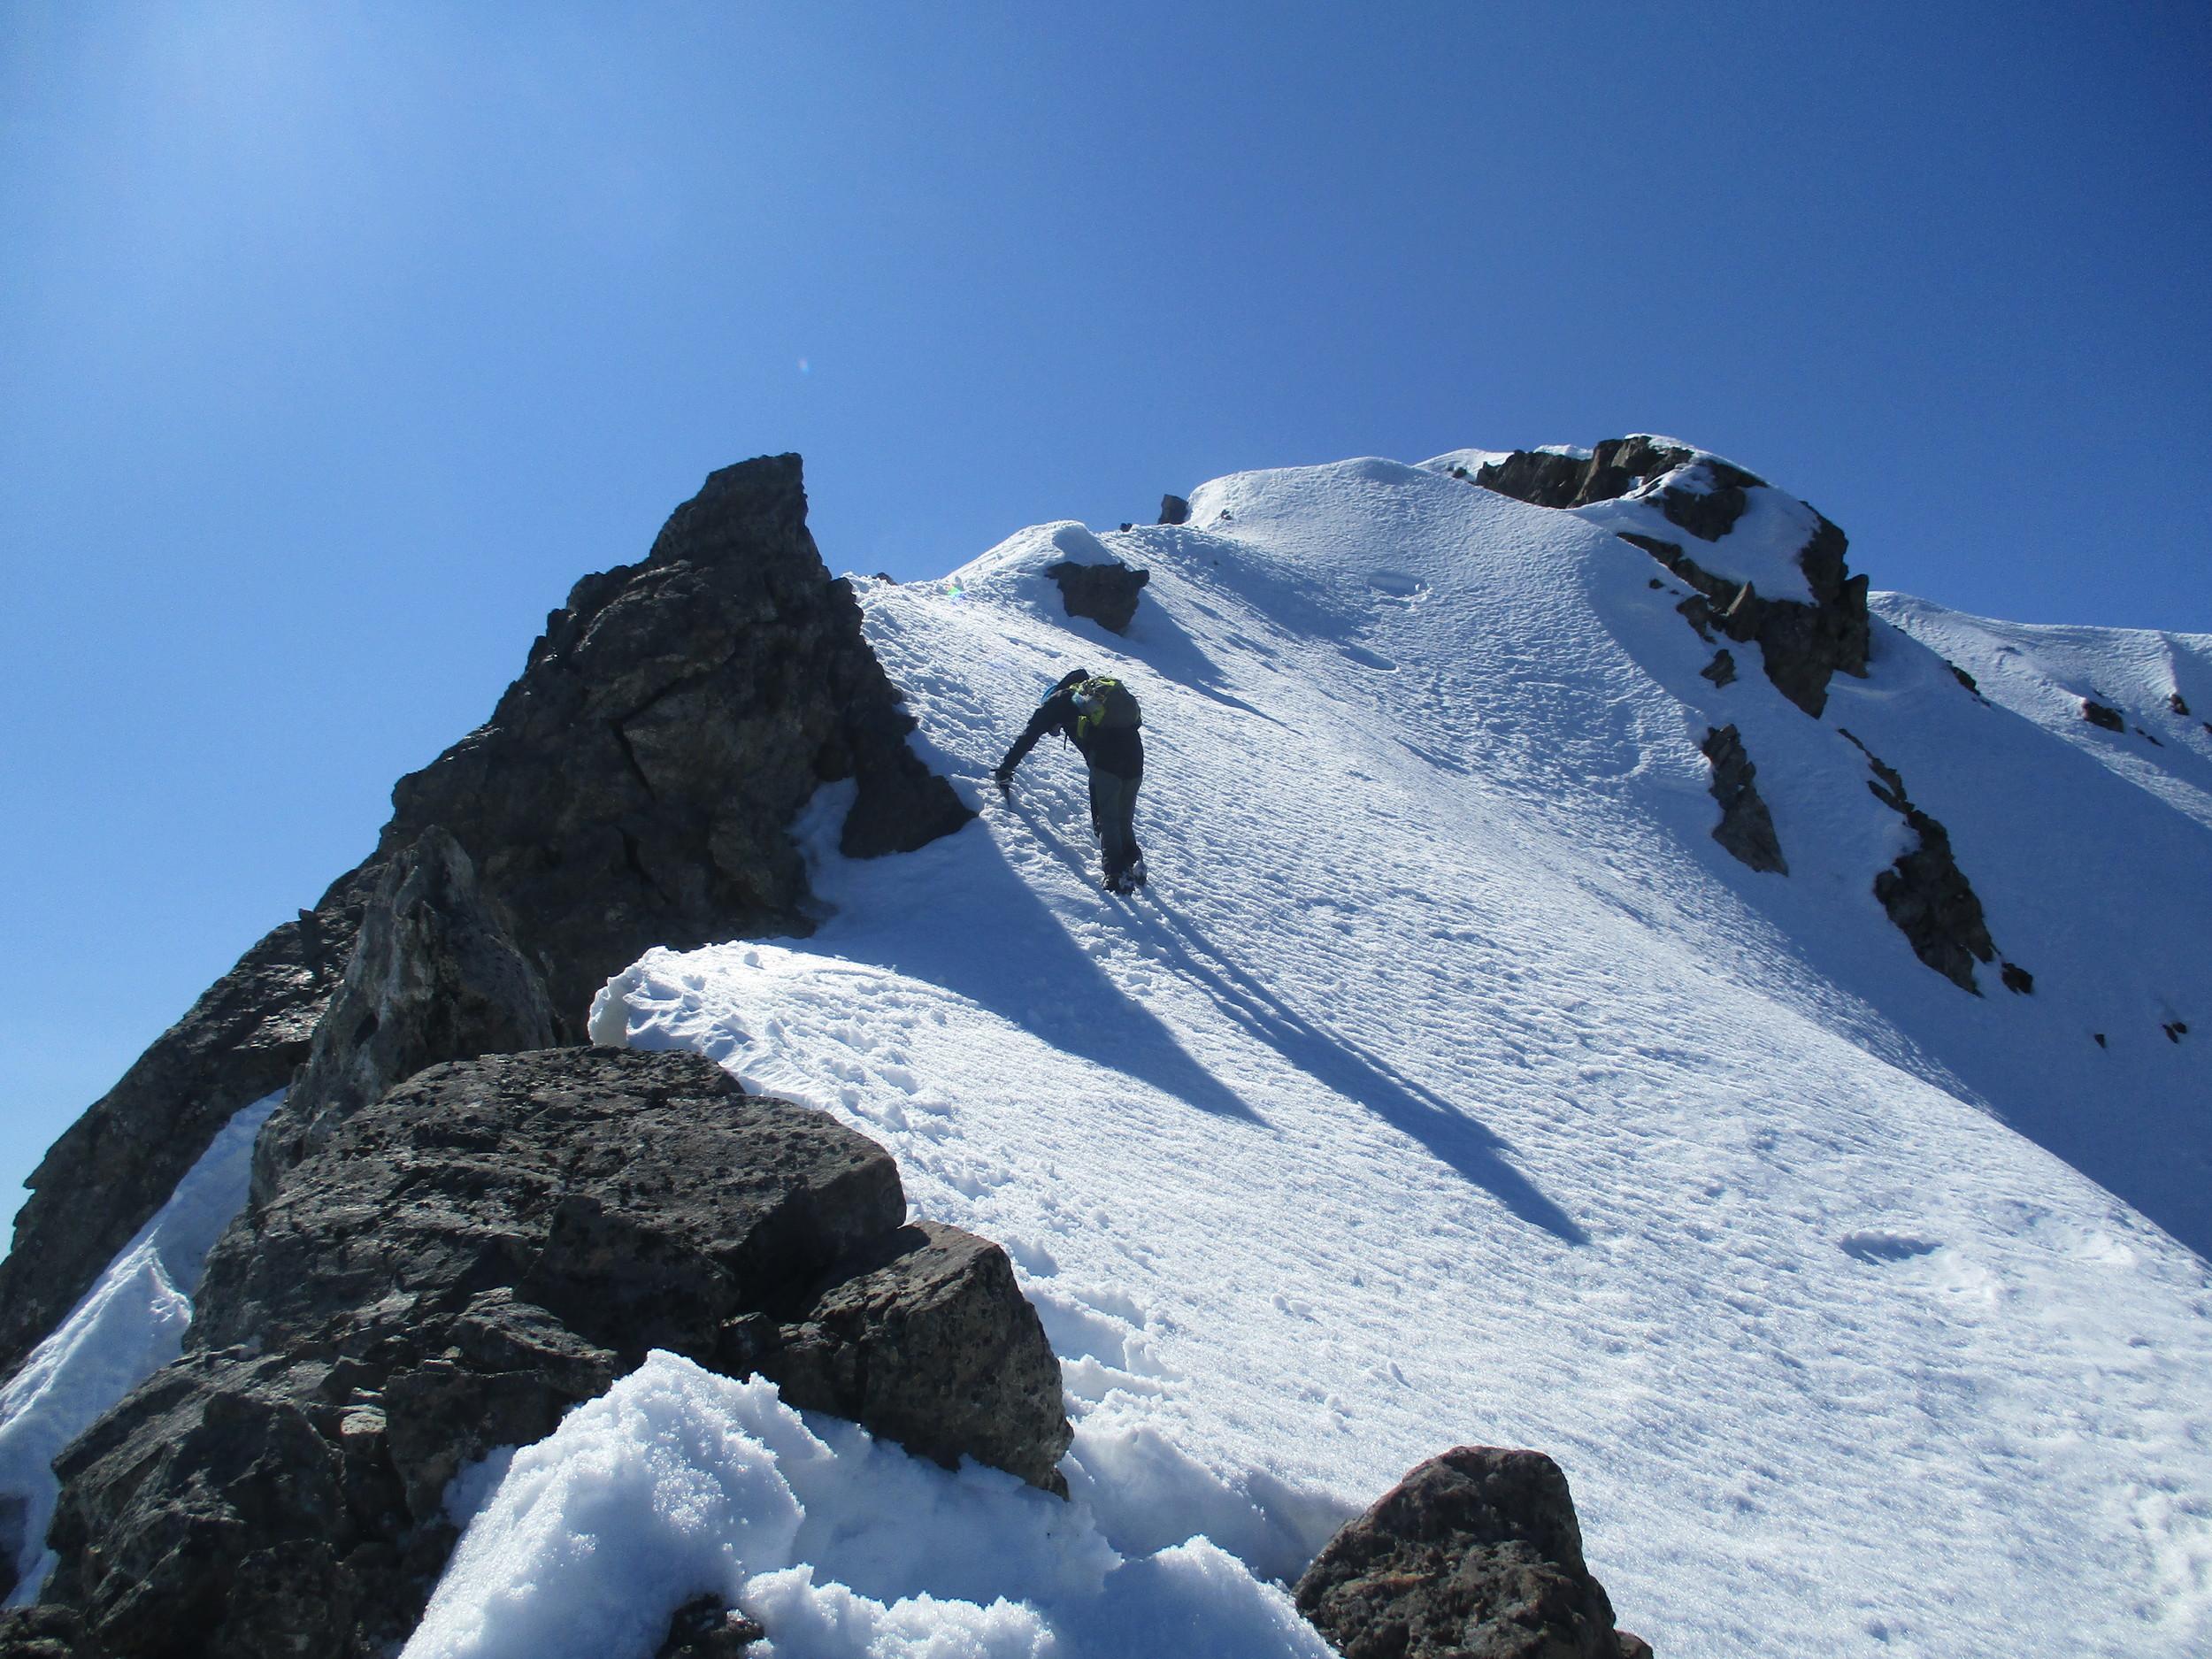 Another tricky bit - Sergio on ridgeline of Mount Chittenden